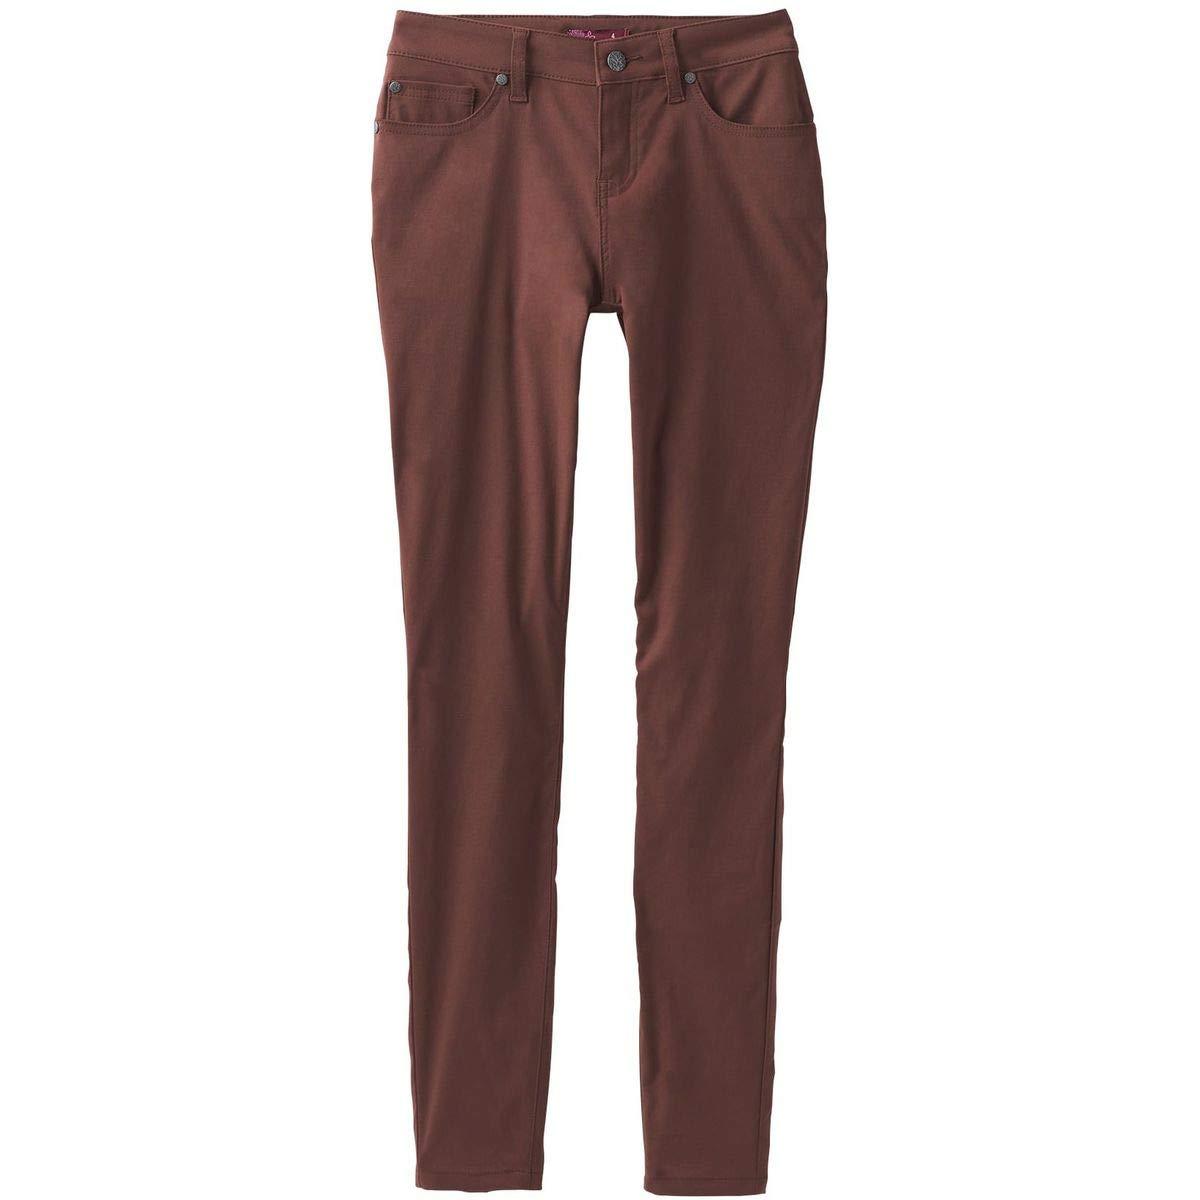 prAna Women's Regular Inseam Briann Pants, 6, Wedge Wood by prAna (Image #3)